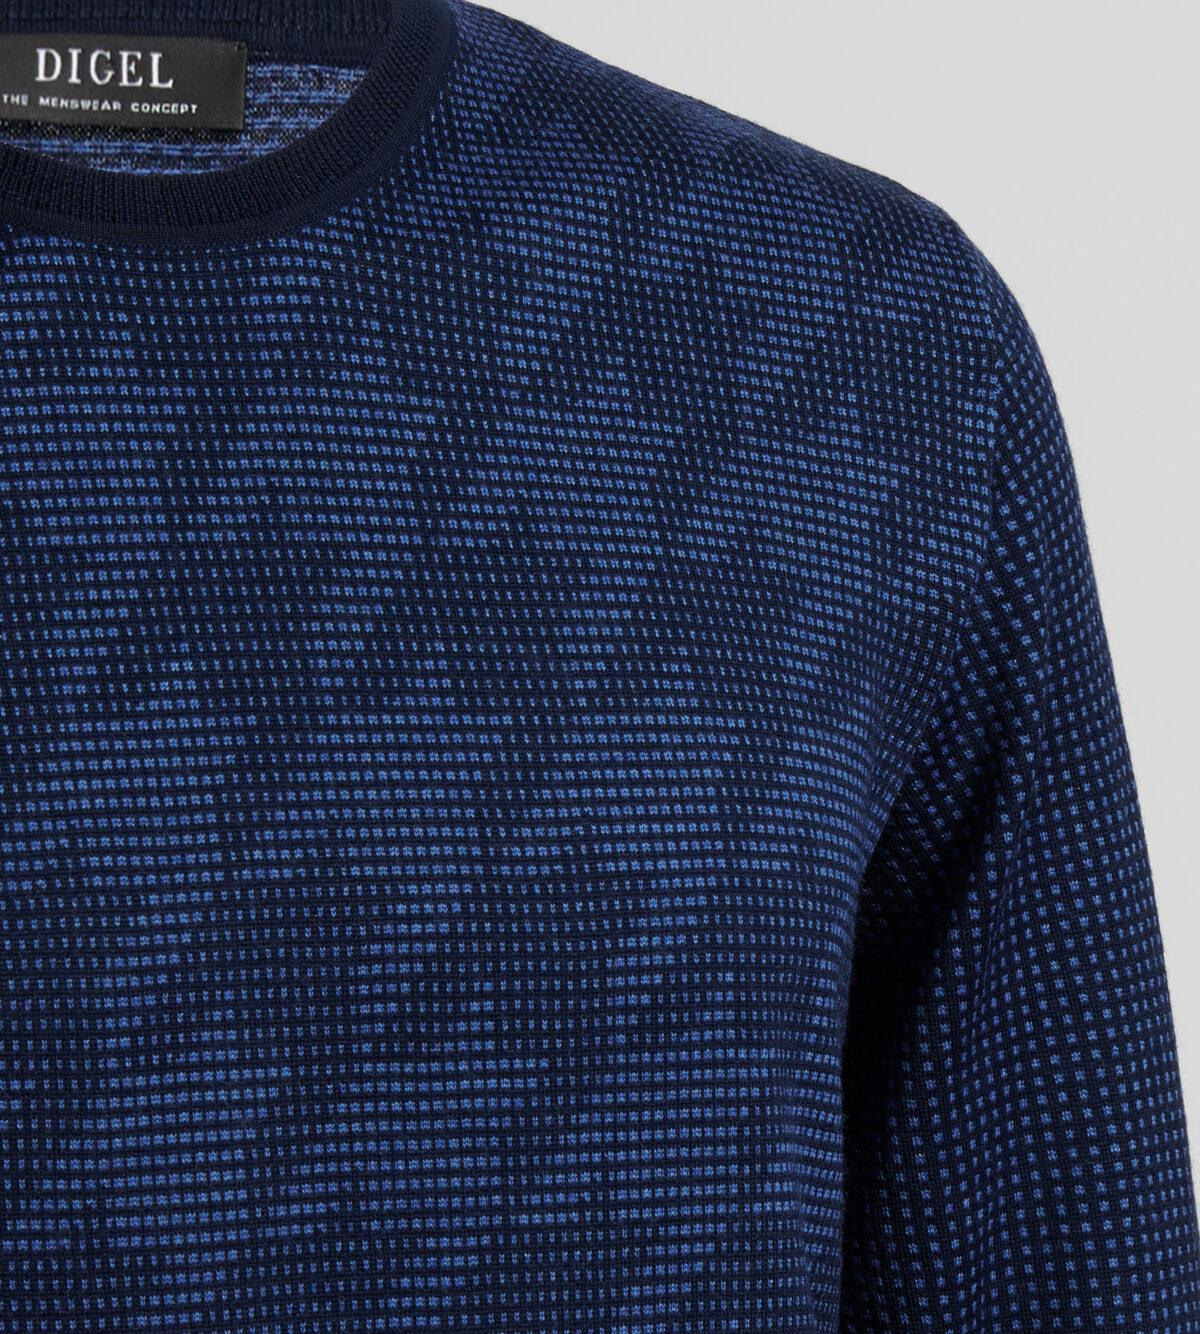 digel-sotetkek-modern-fit-kerek-nyaku-tyuklabmintas-gyapju-pulover-faros1-1-1288010-20